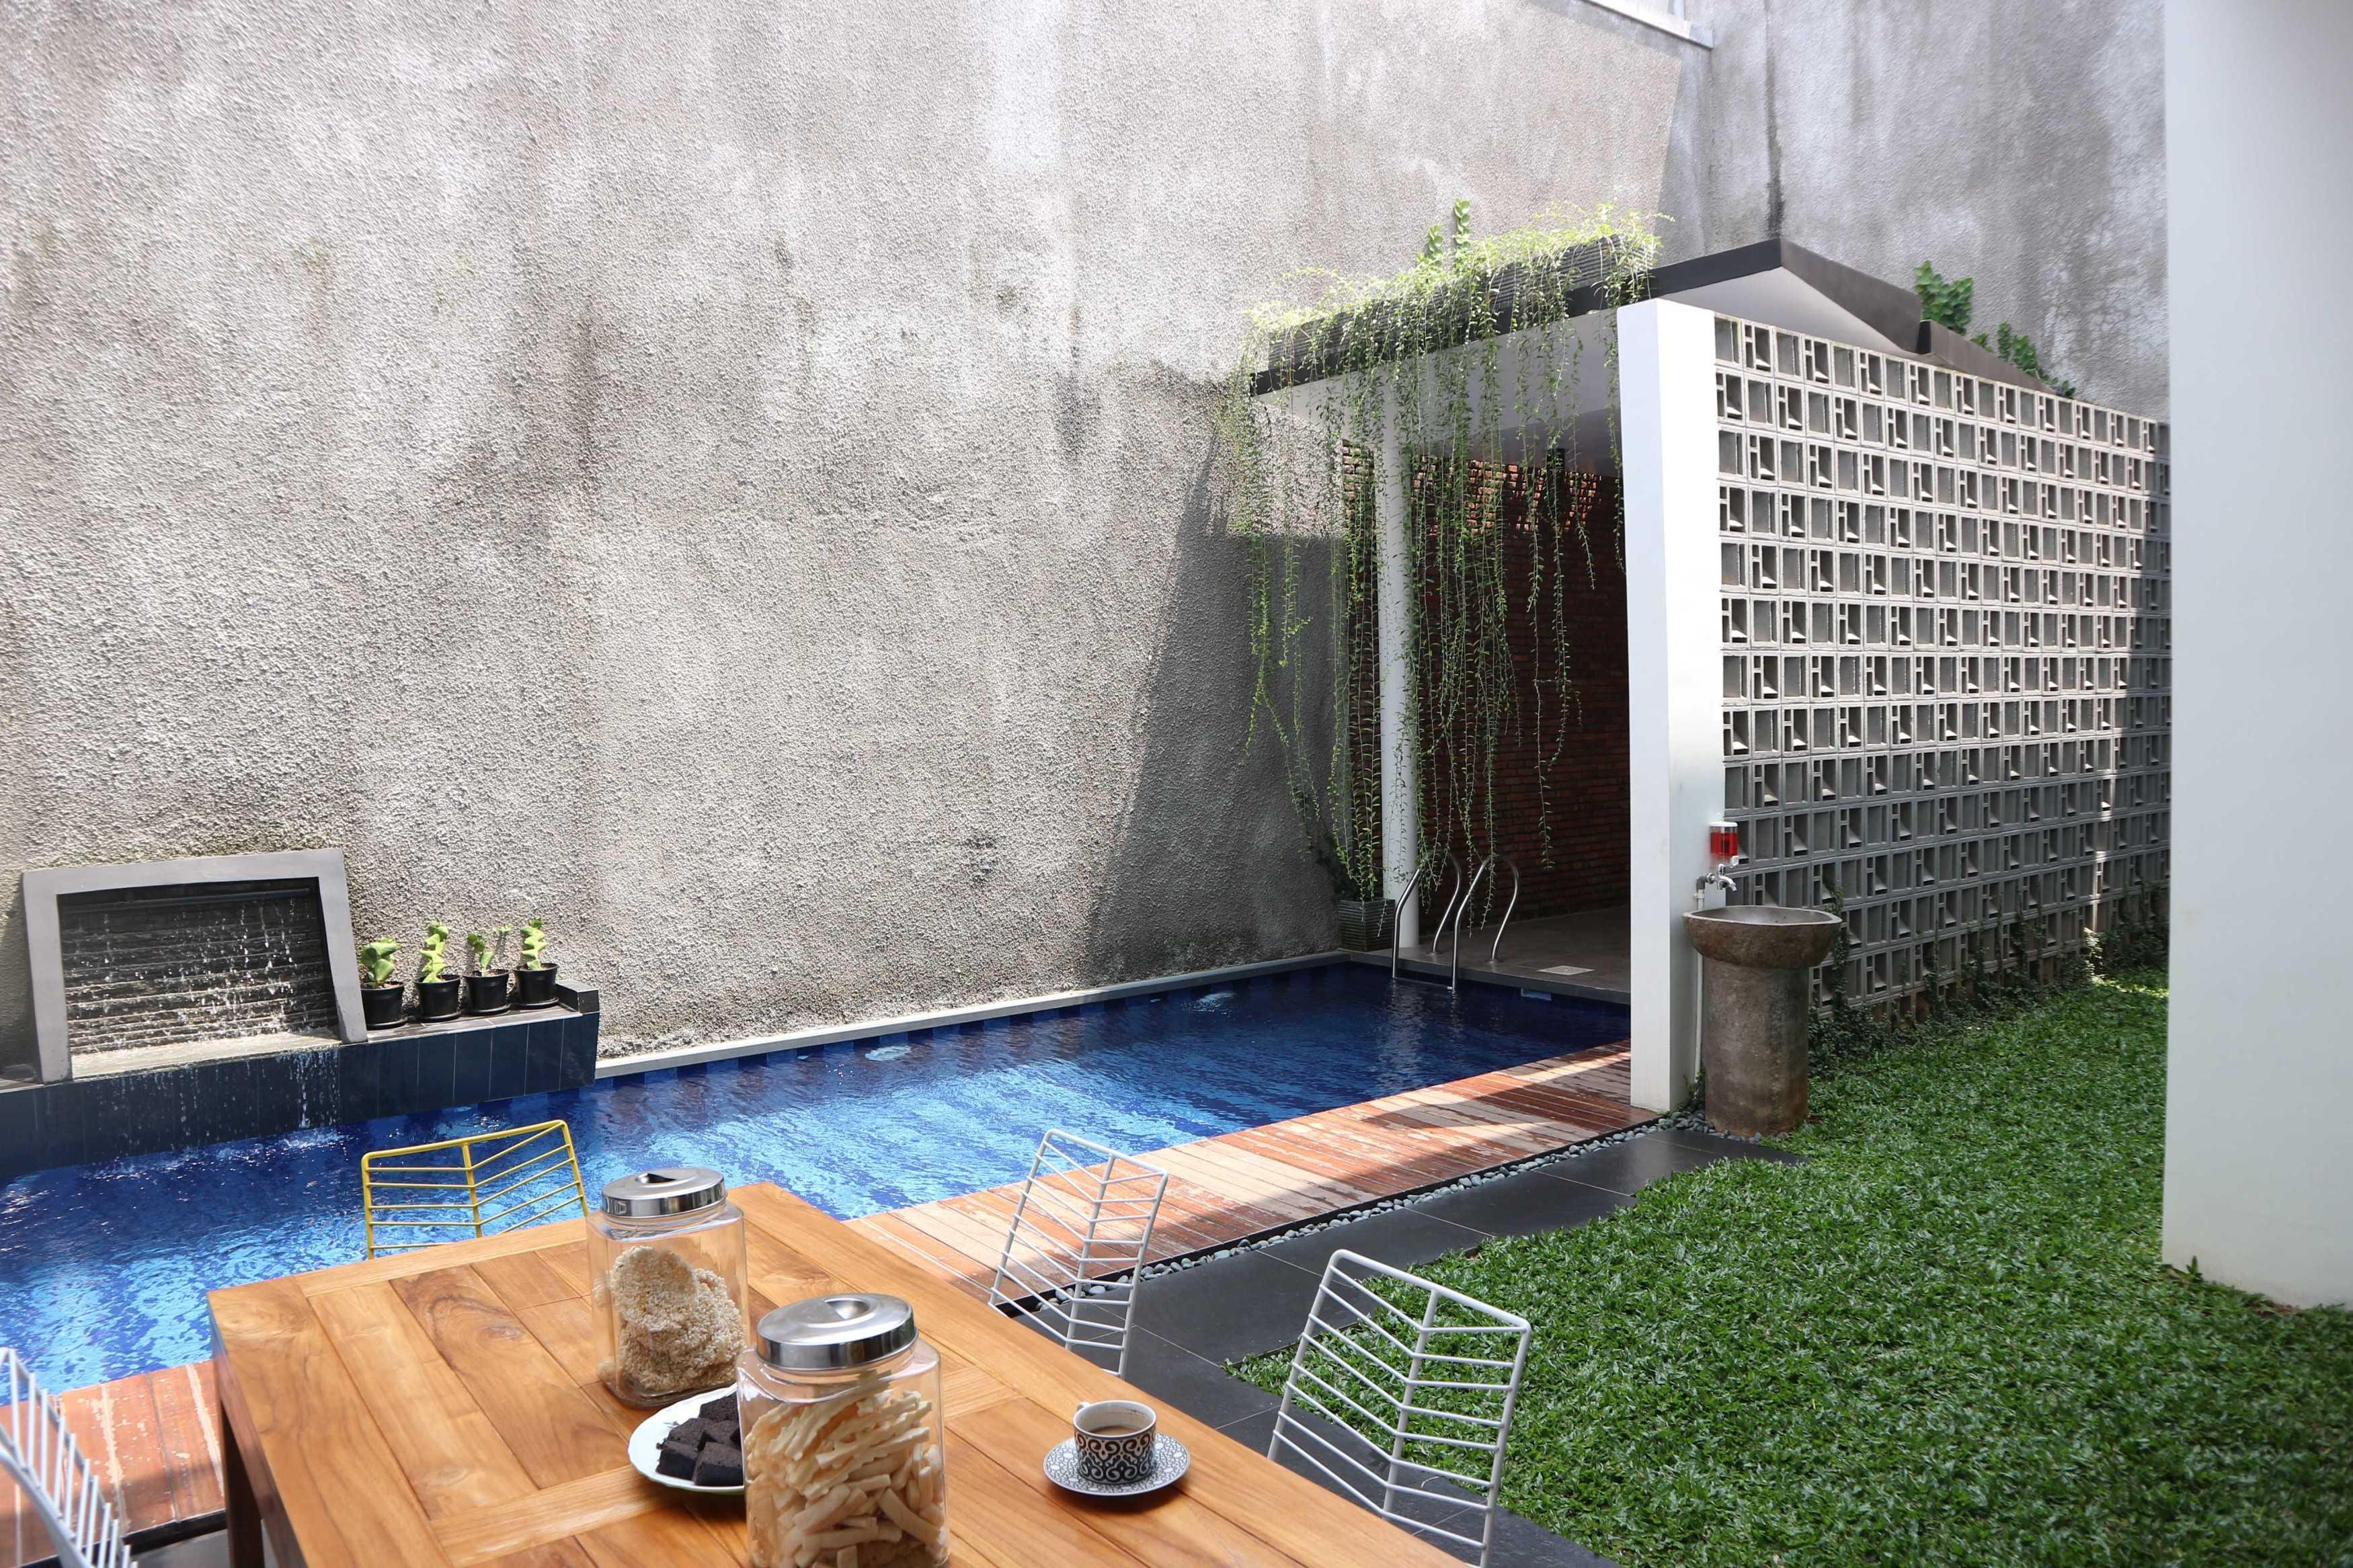 Jerry M. Febrino Rs House Jl. Pesona Paris, Ciangsana, Gn. Putri, Bogor, Jawa Barat 16968, Indonesia Kota Wisata Img3467 Modern  38110